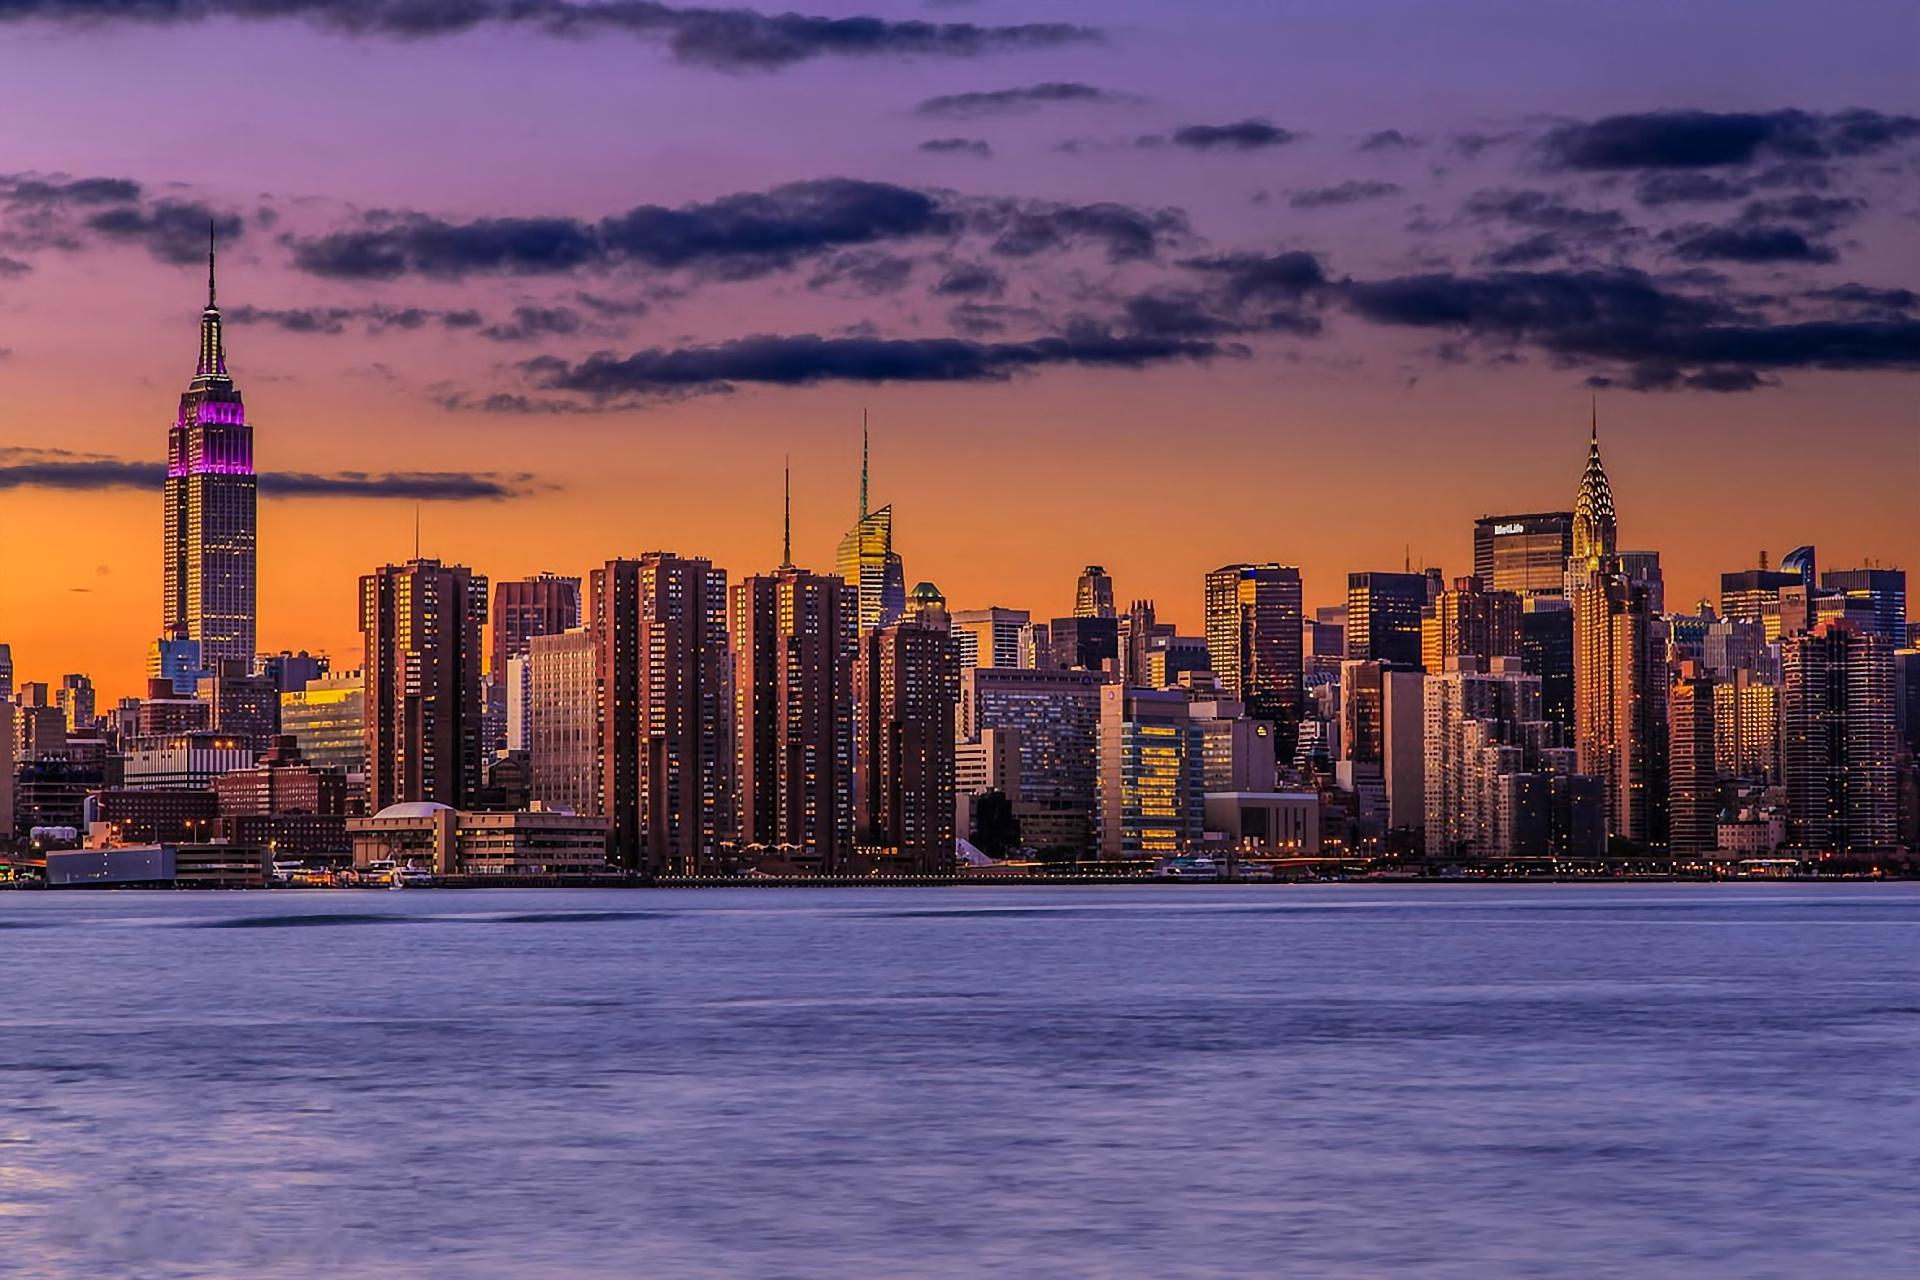 city sunset wallpaper 7106 - photo #1